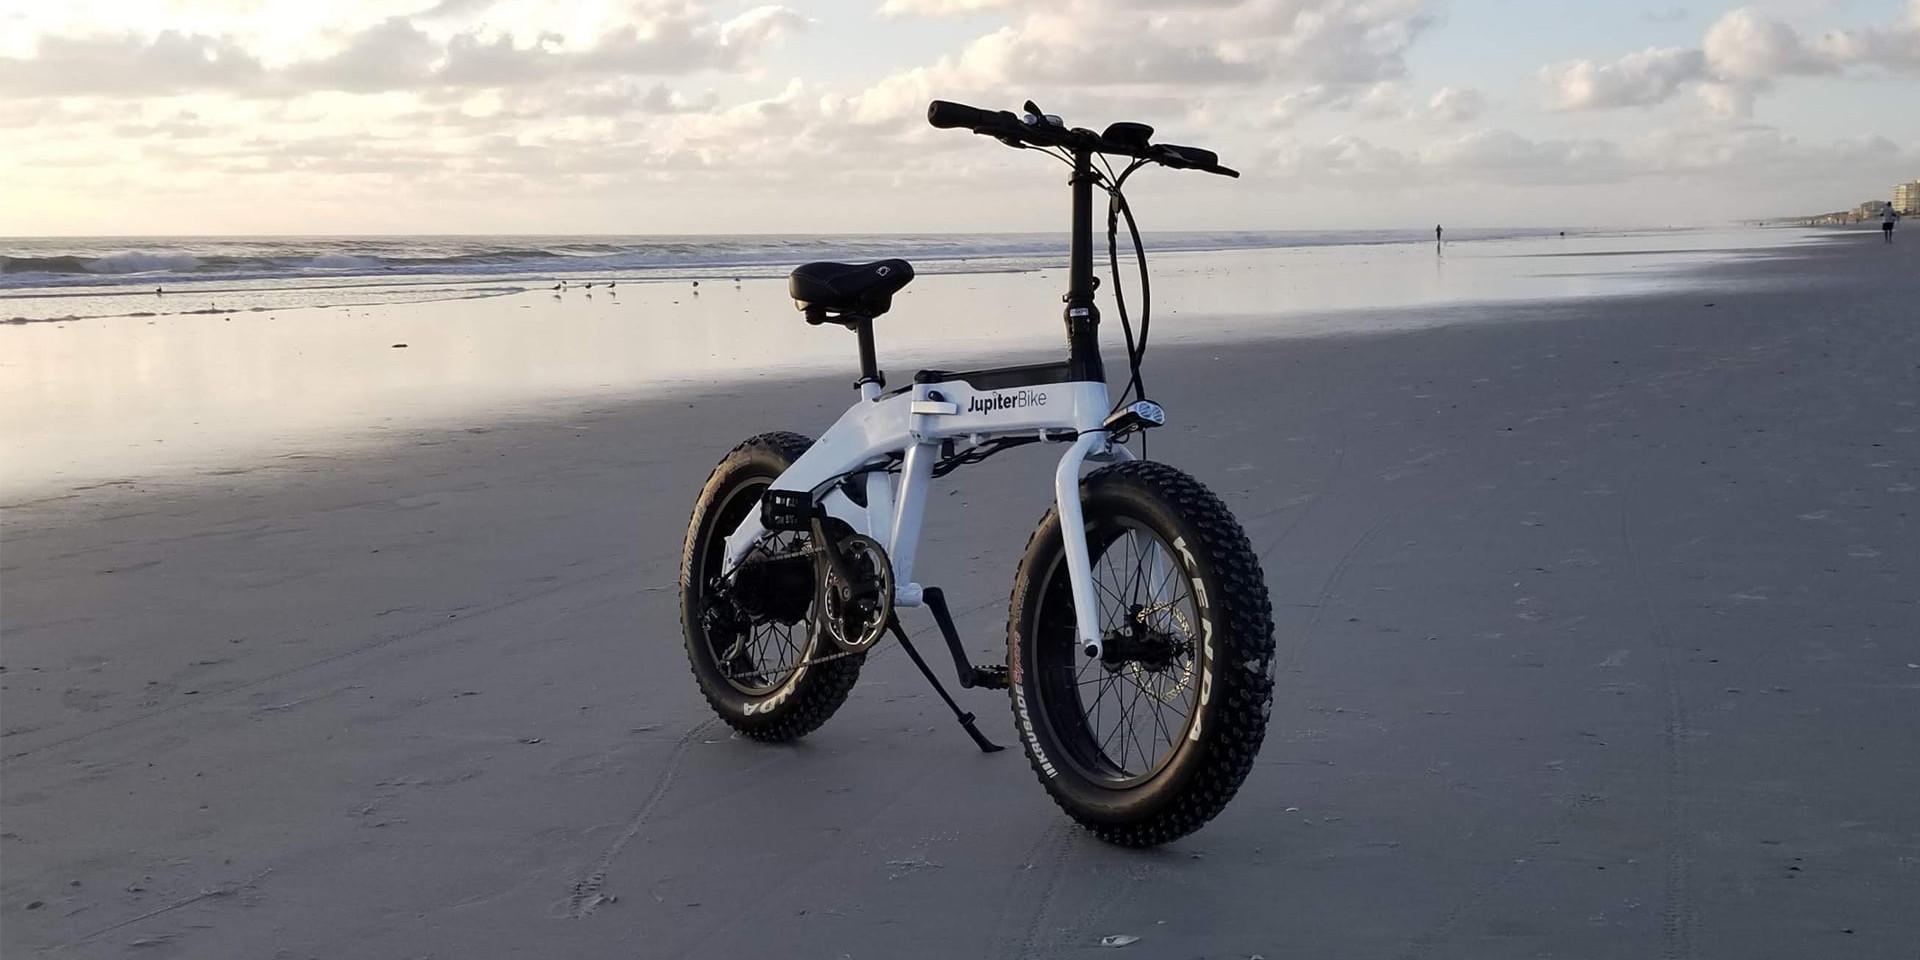 Jupiter Bike Defiant Folding Fat Tire Ebike on beach